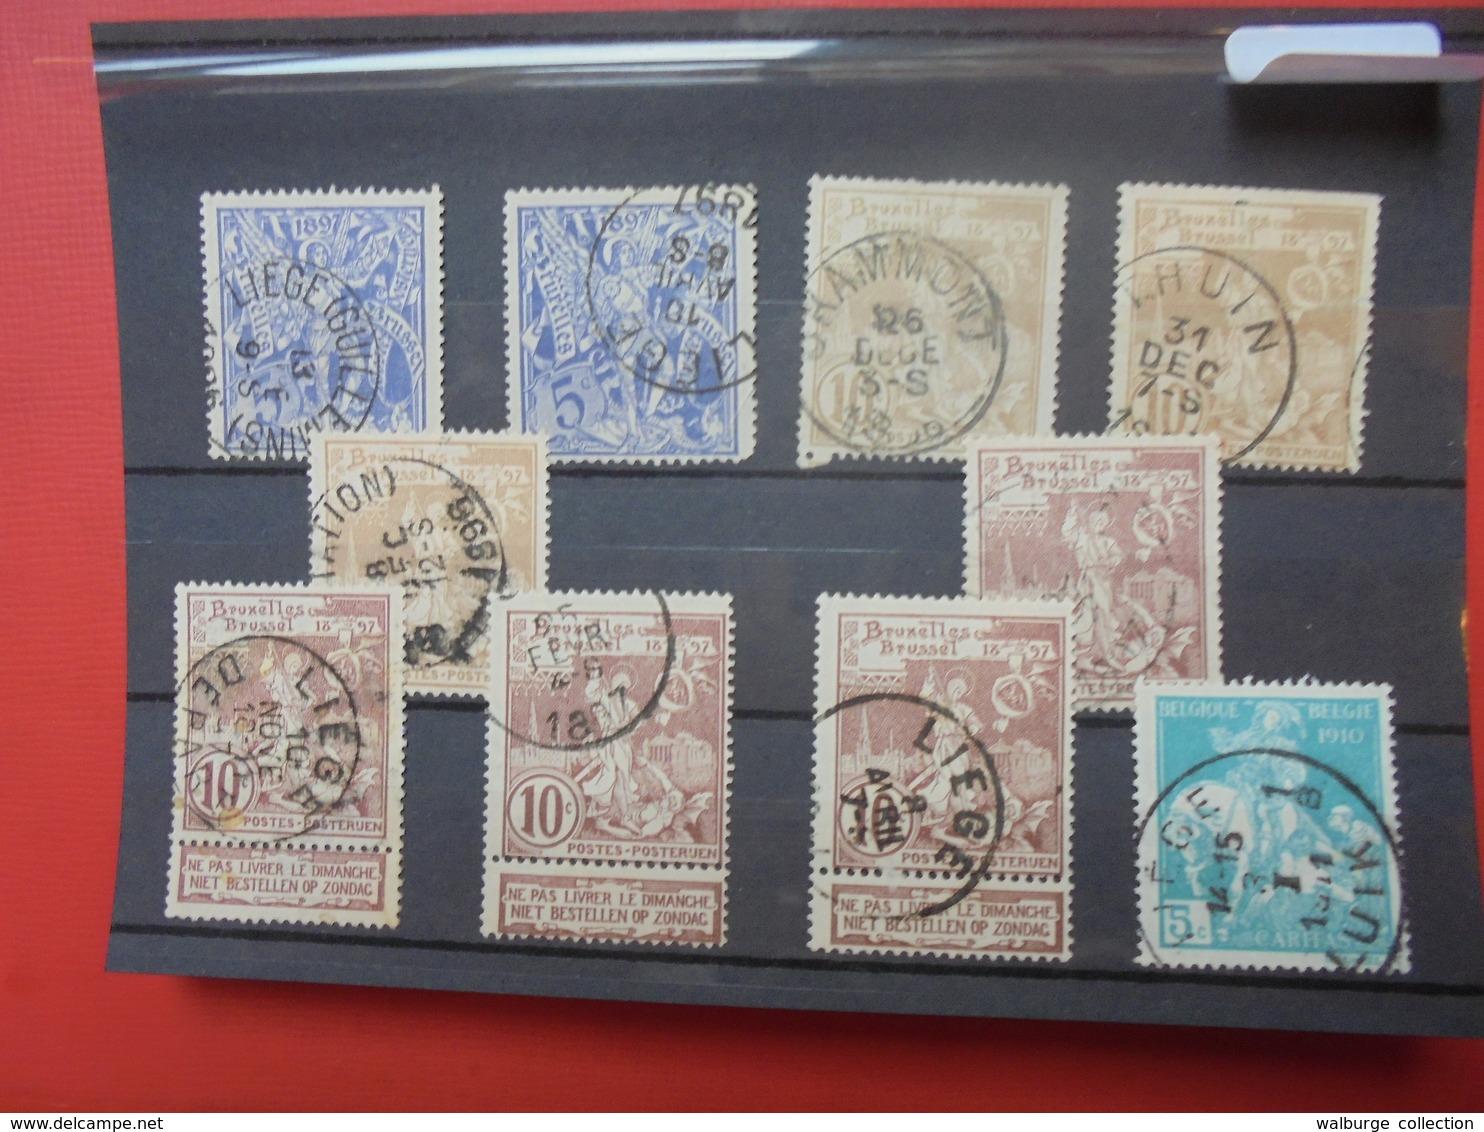 BELGIQUE N°71+72+73+90 OBLITERES-JOLIE SELECTION(416) - Collections